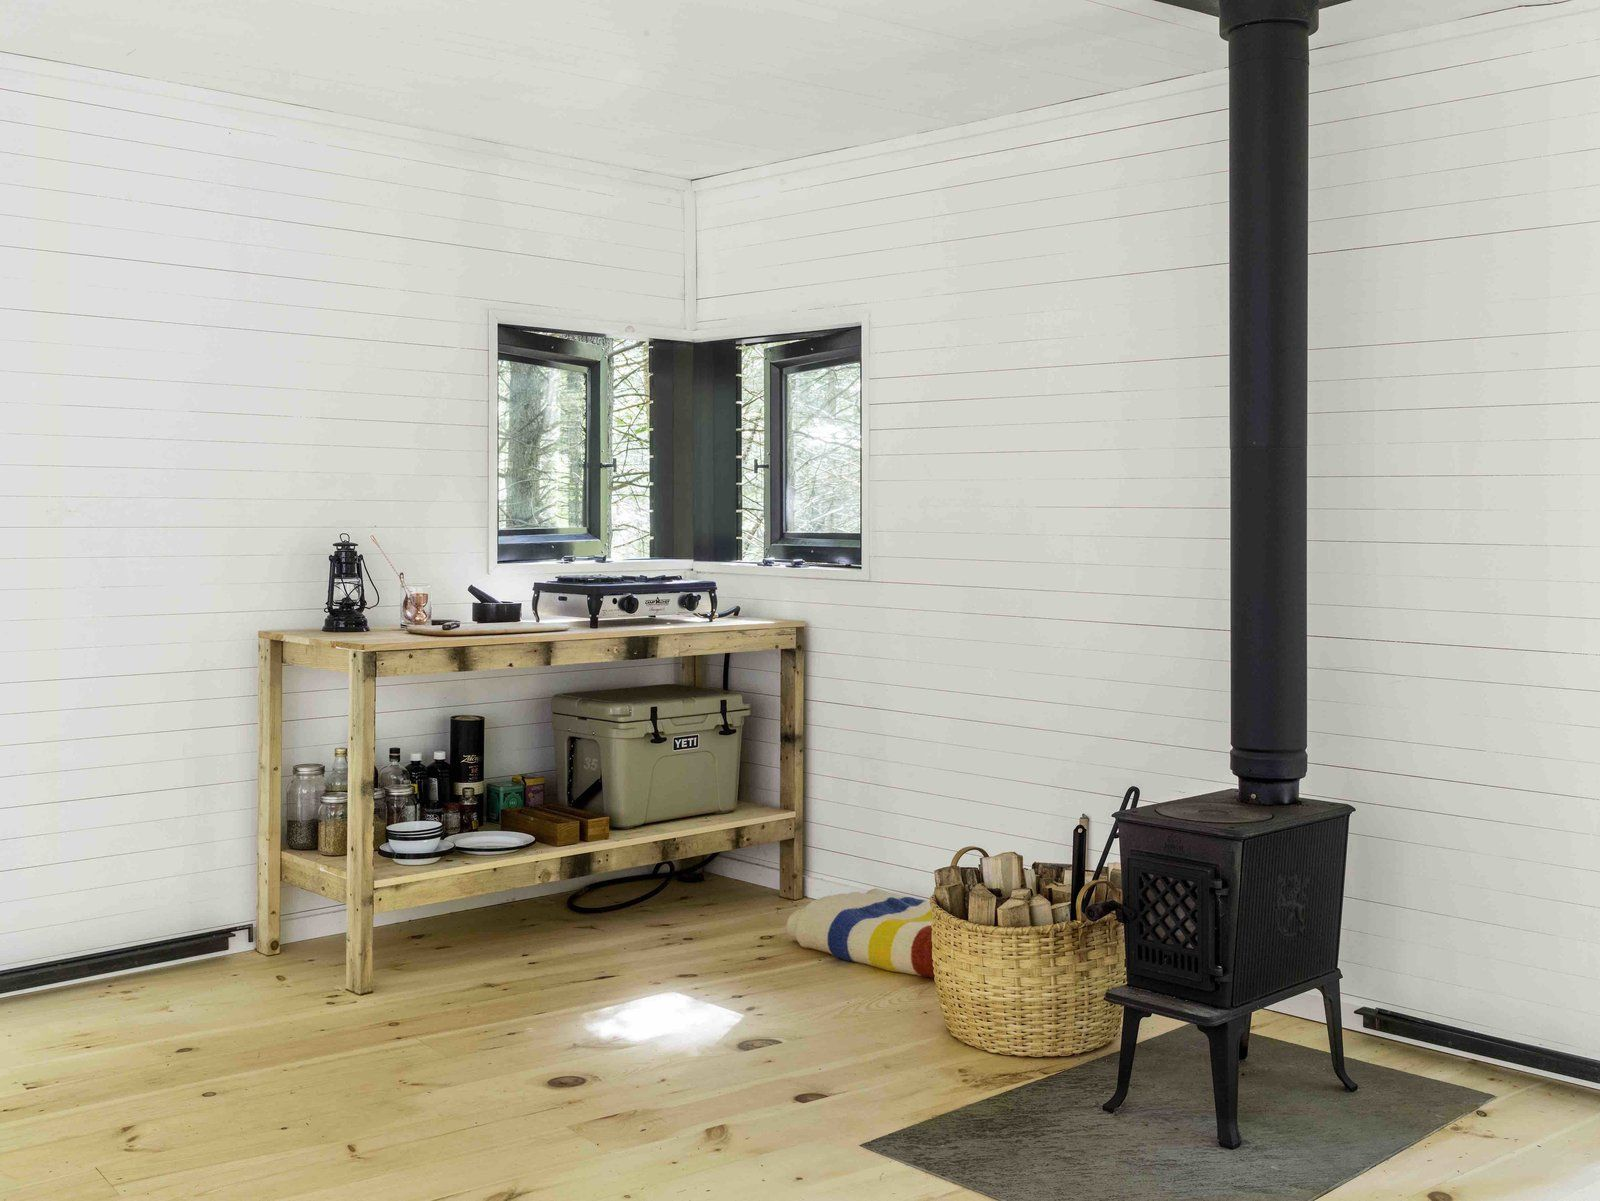 Diy Keuken Kleine : Dwell a dramatic tree house by budget conscious diy builders